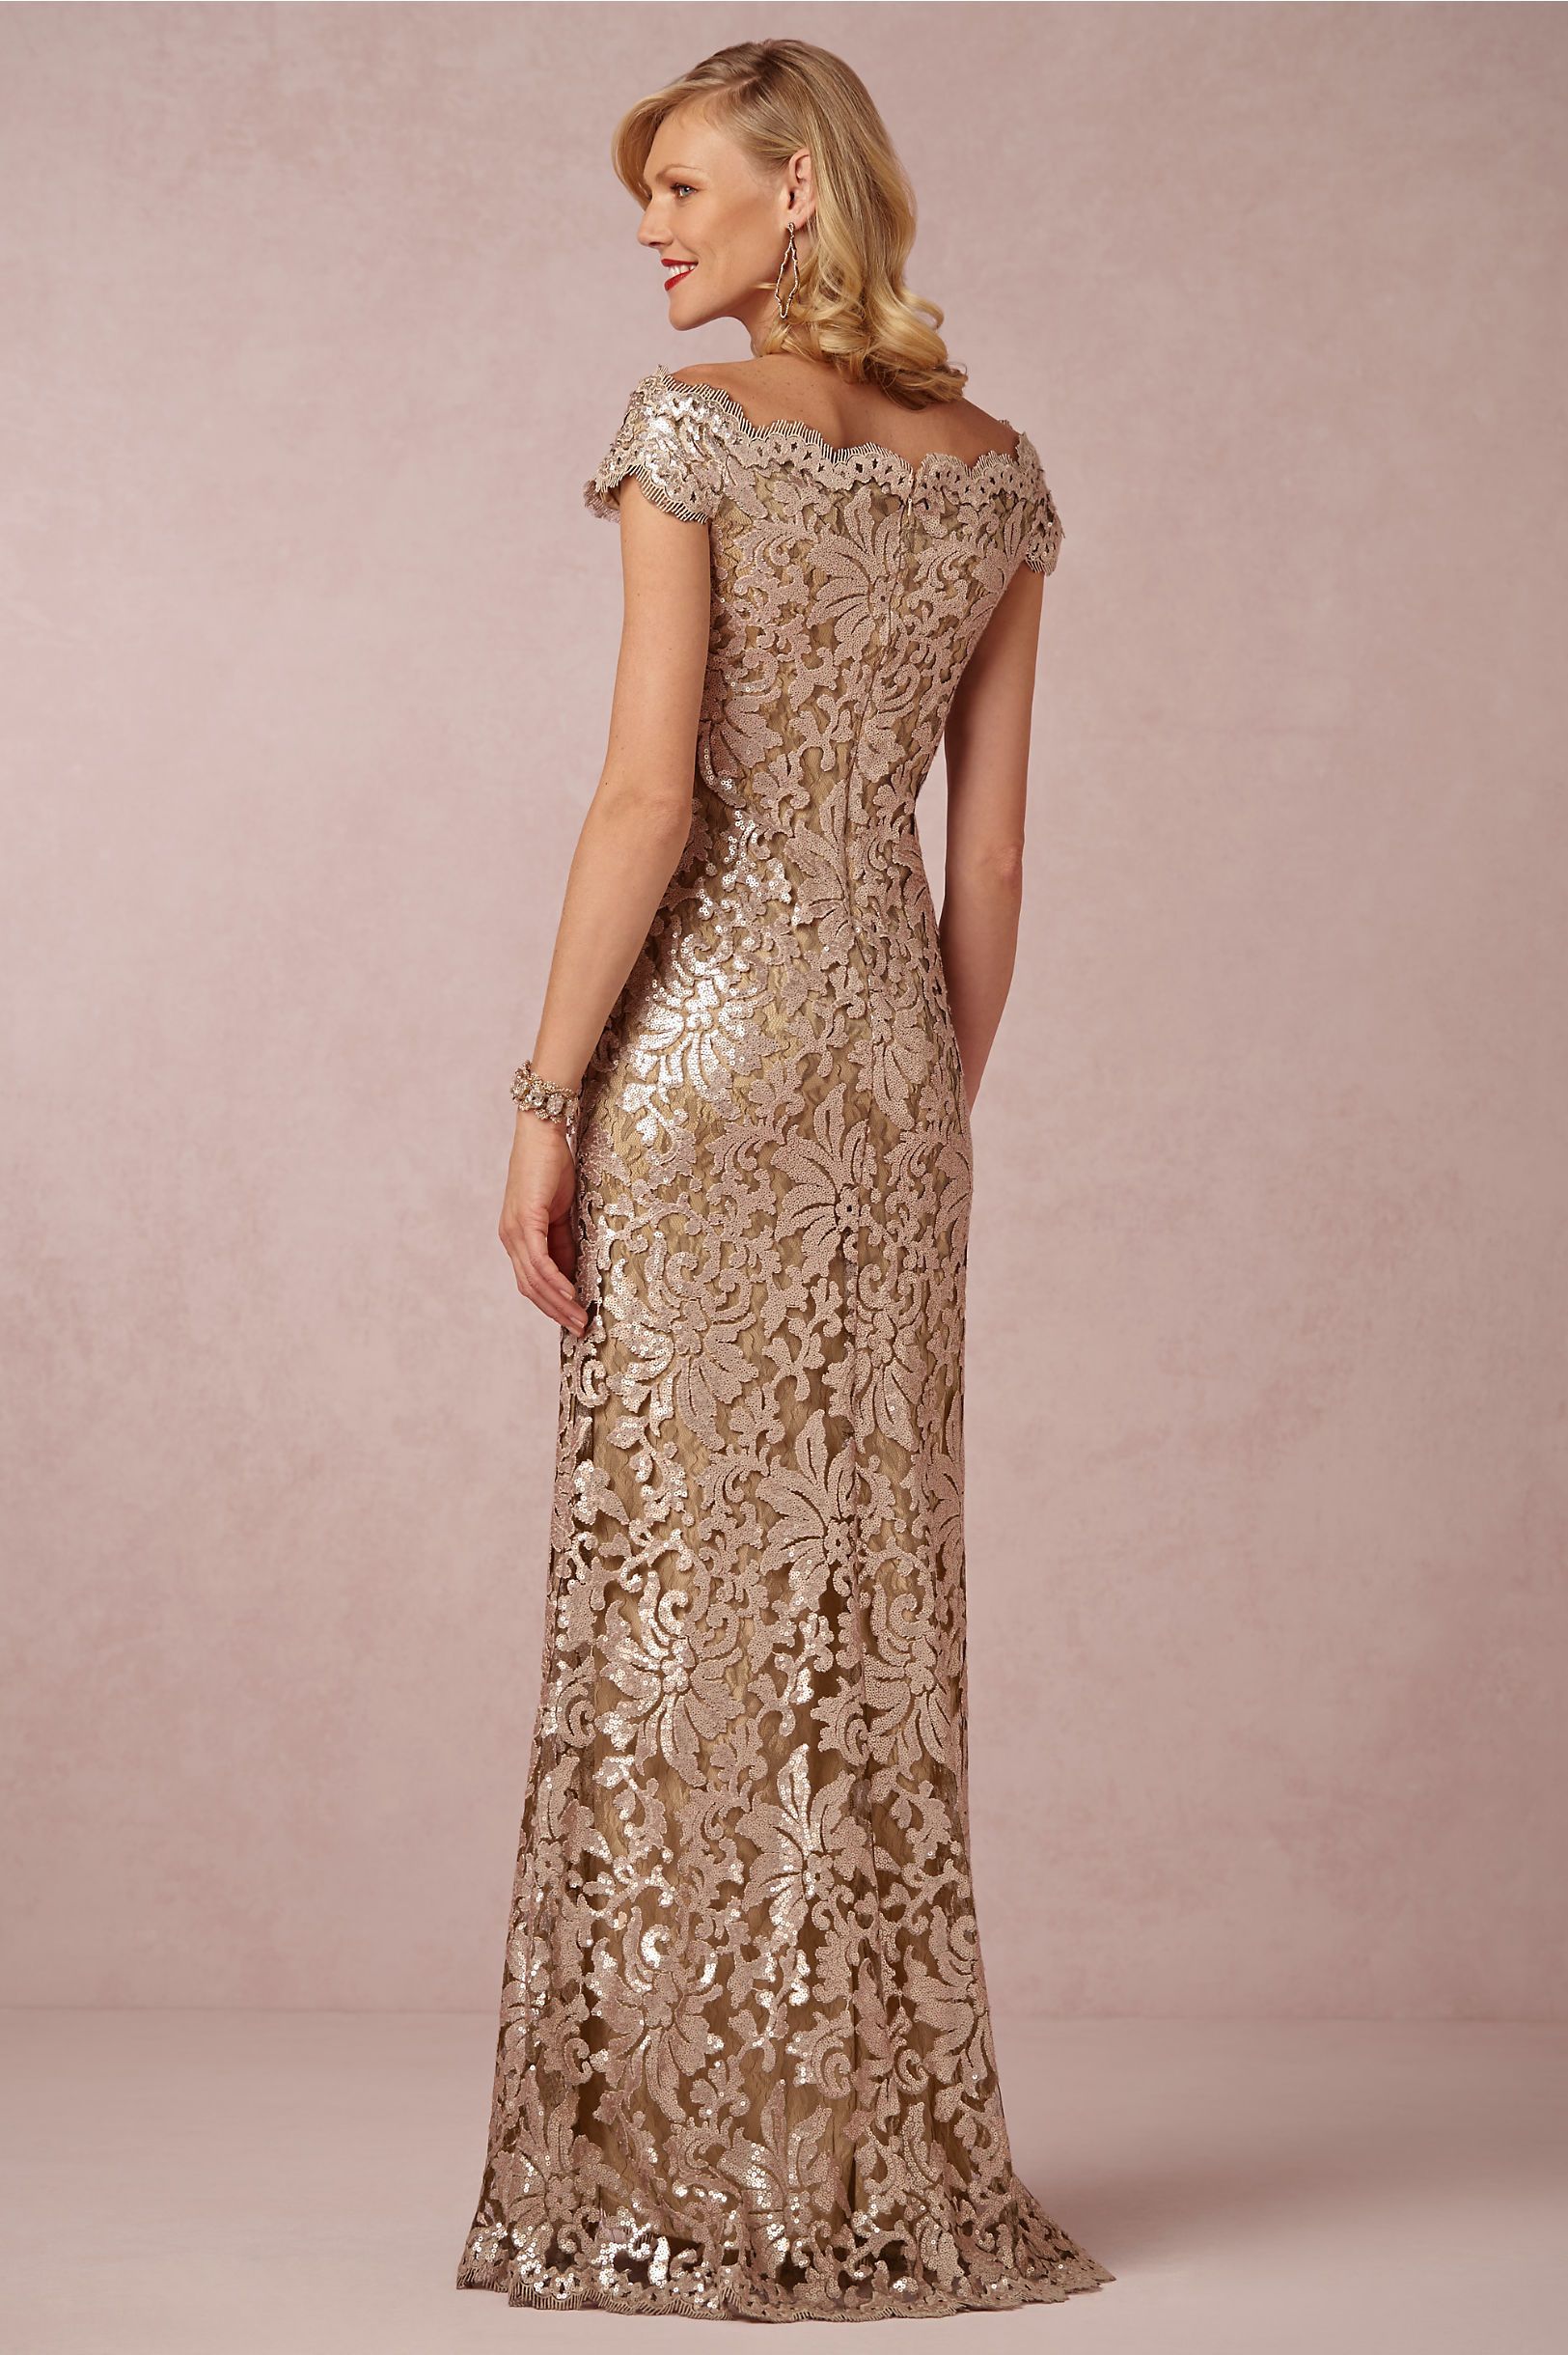 Gold dresses for wedding  Mother of the bride dress  kalaus board  Pinterest  Bride dresses